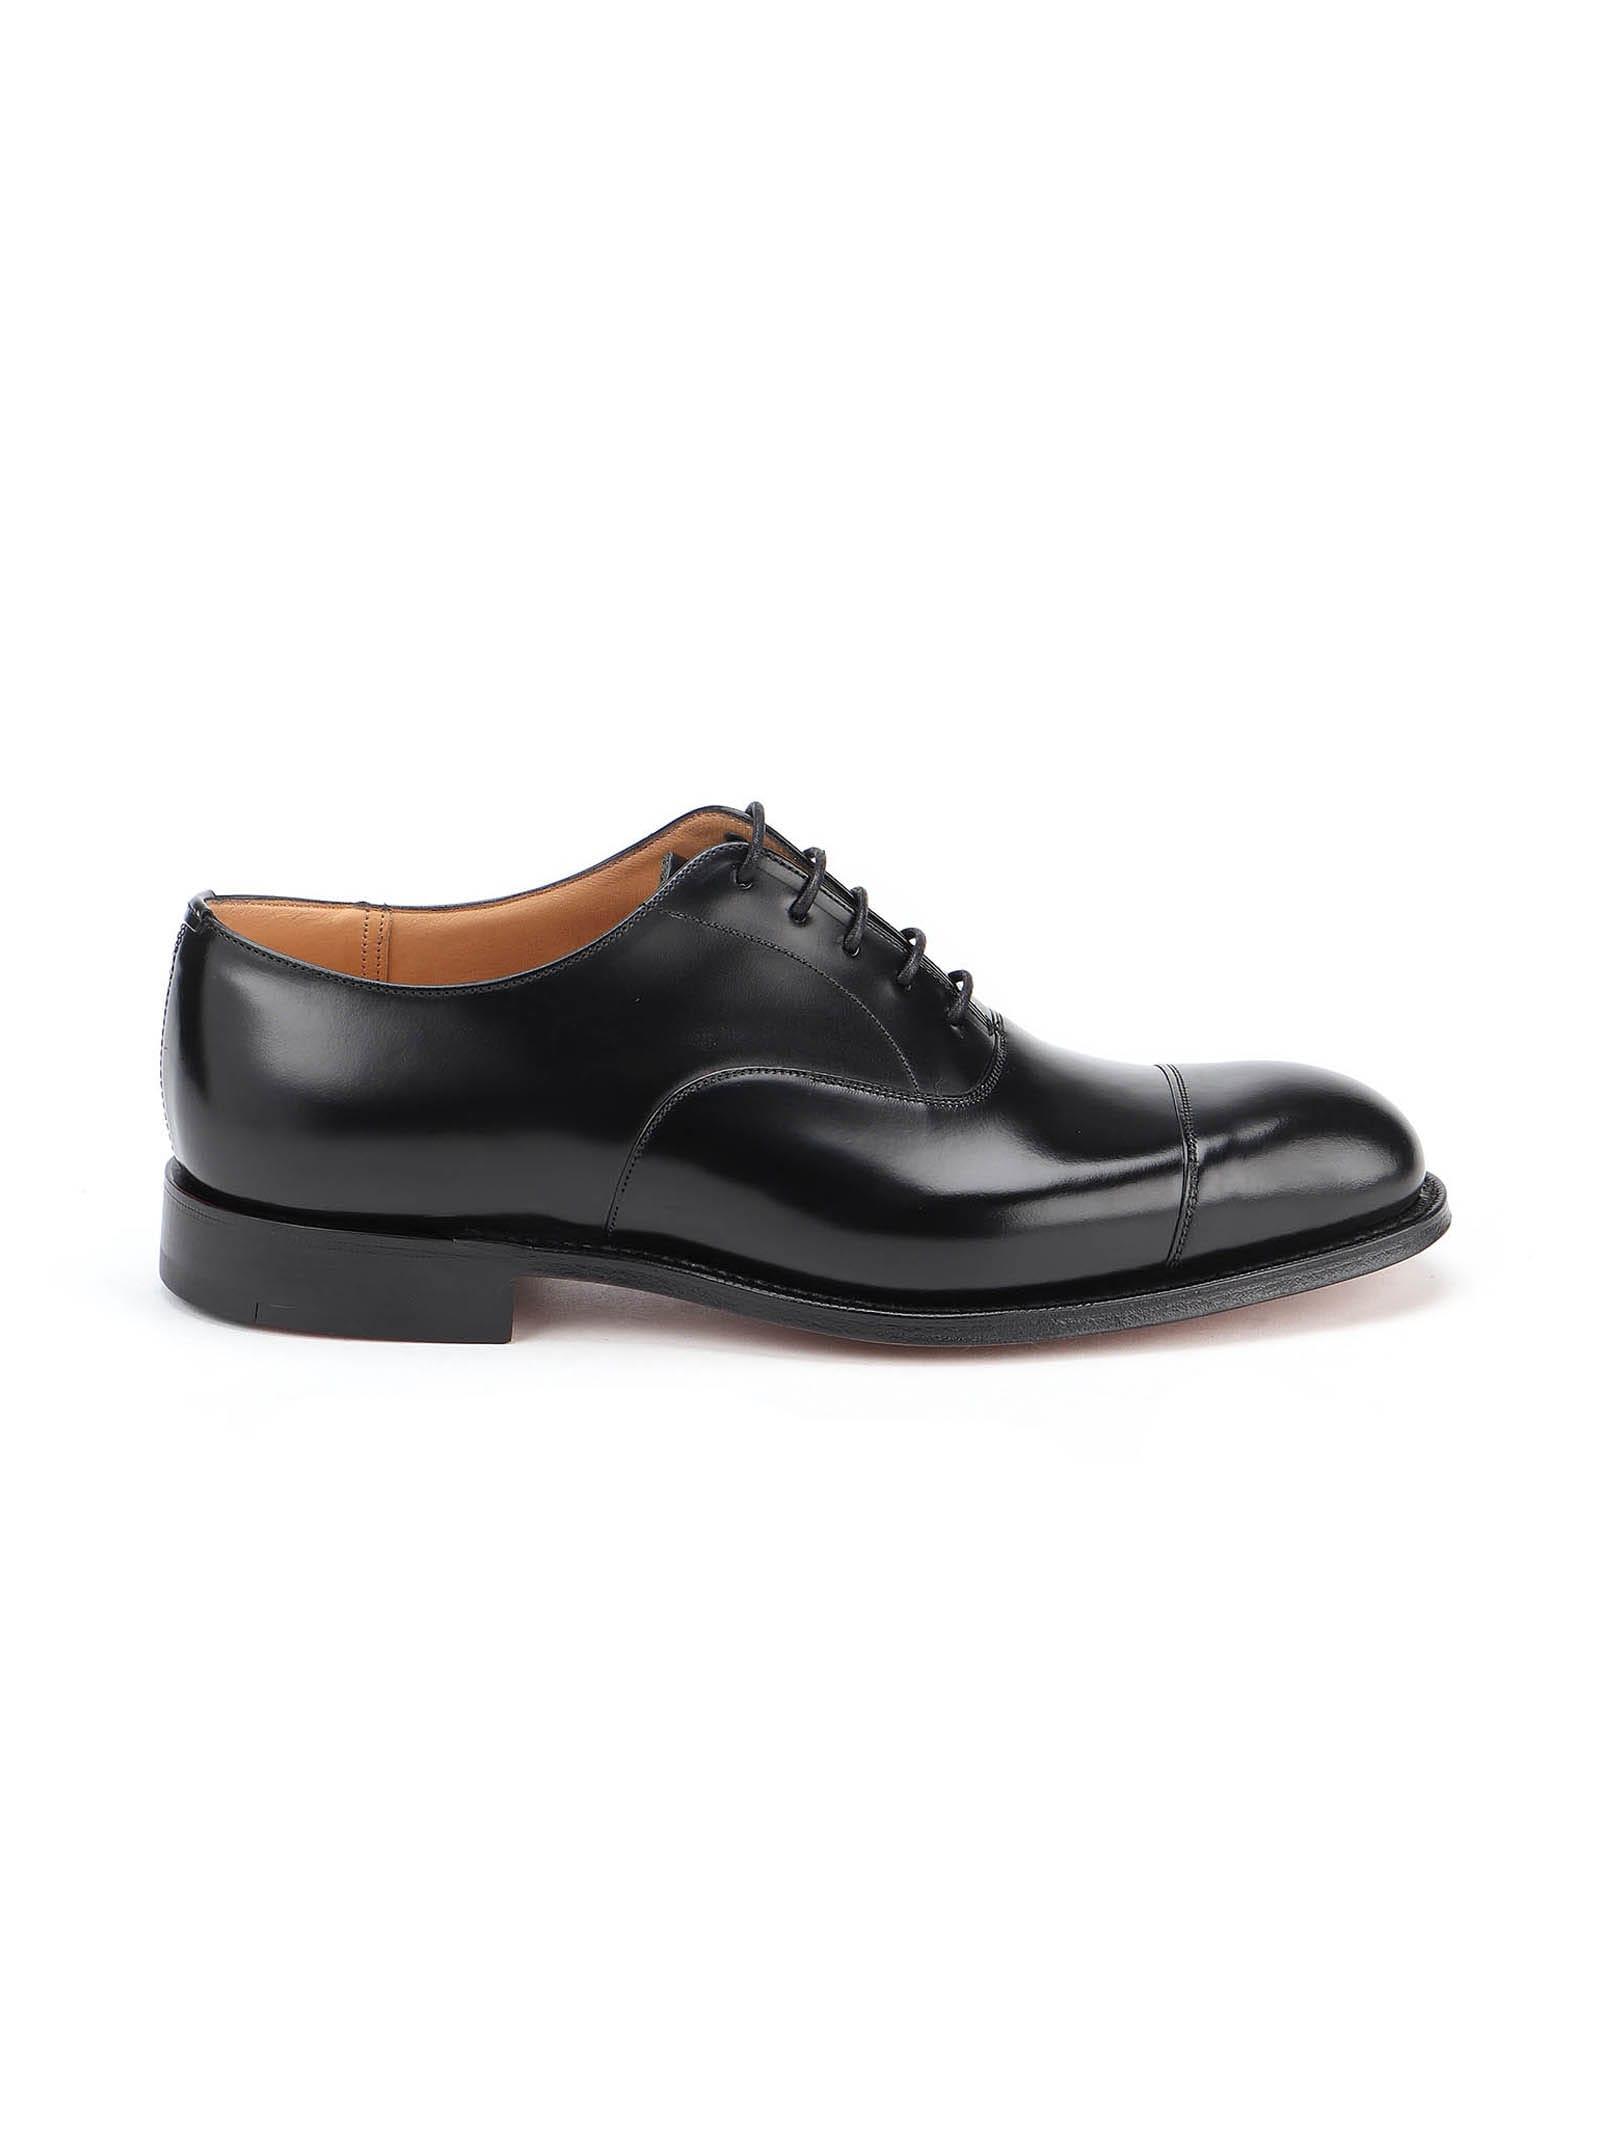 Churchs Consul 173 Oxford Shoe